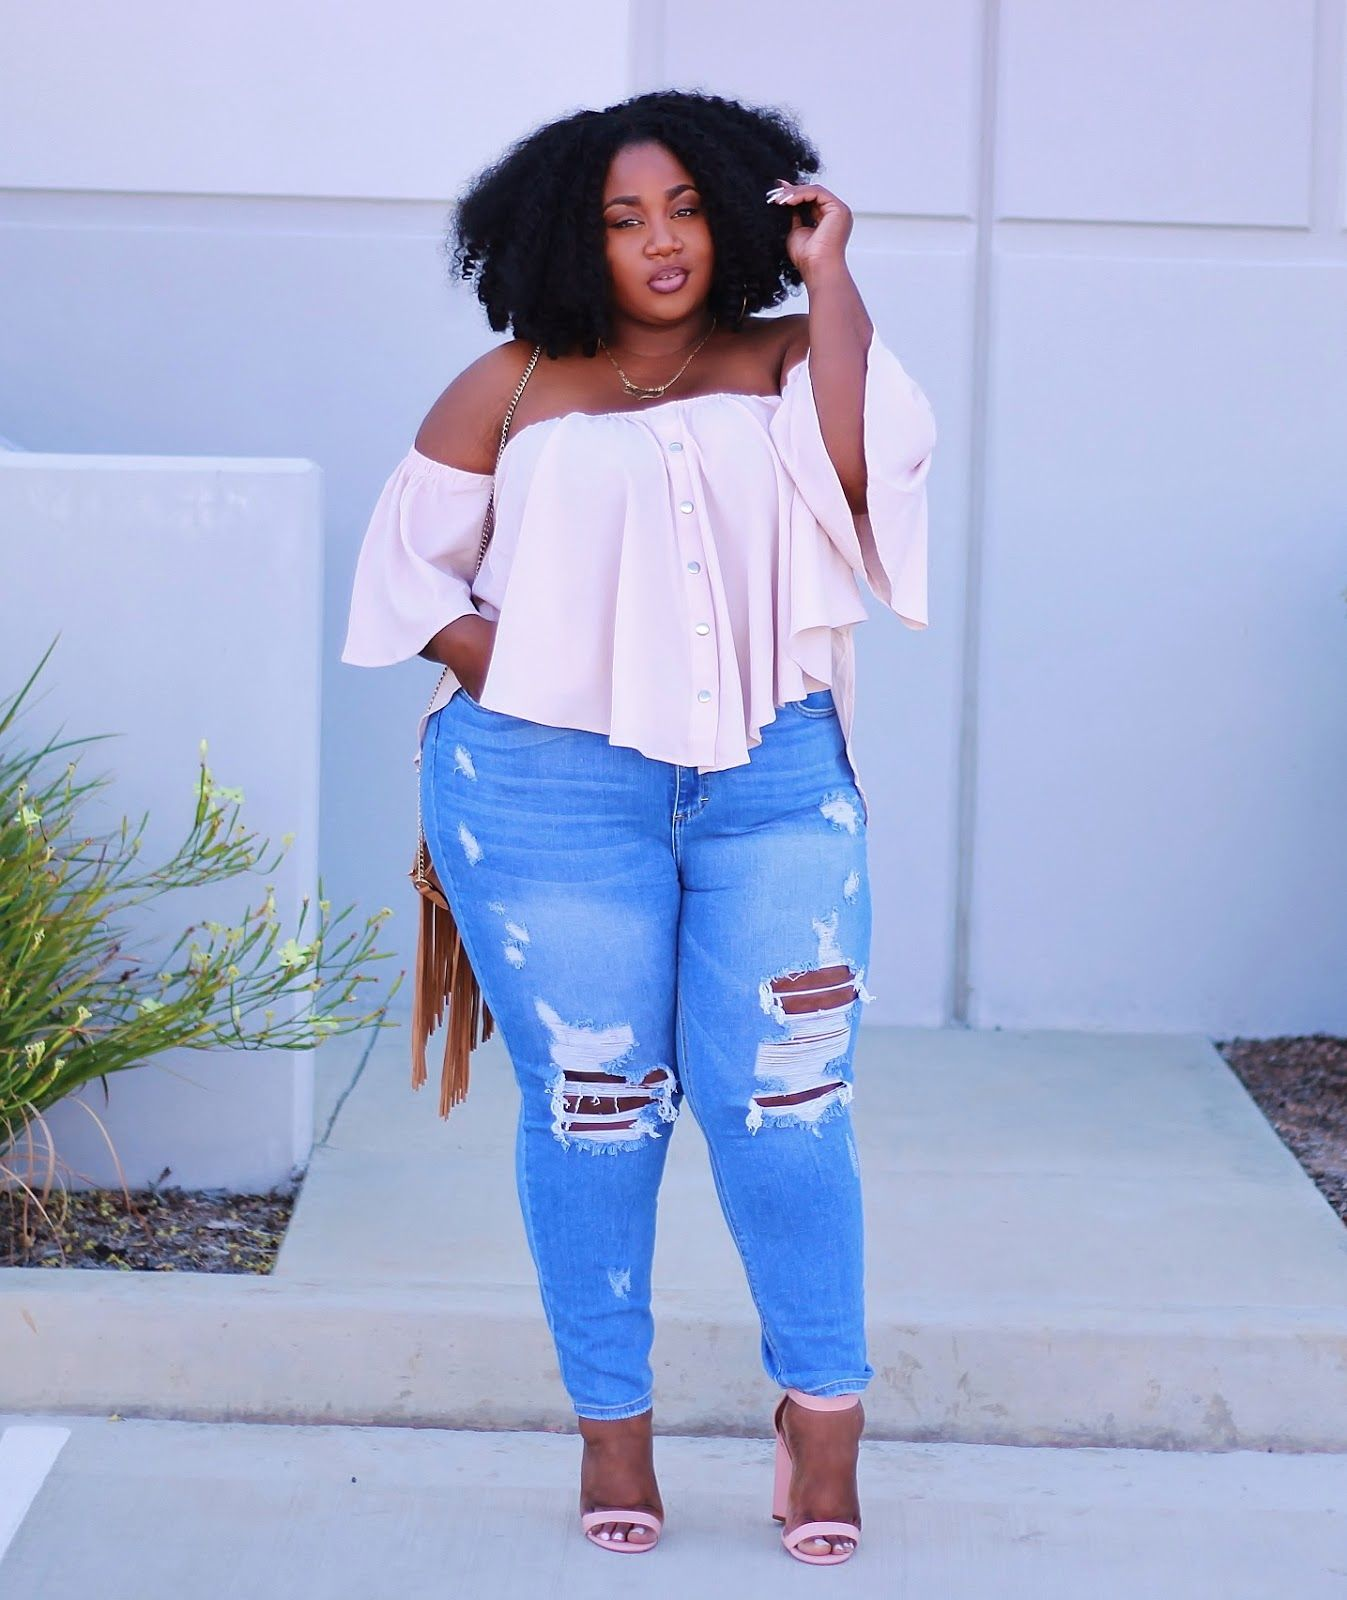 Plus Size Fashion for Women - LACE N LEOPARD: Blushing